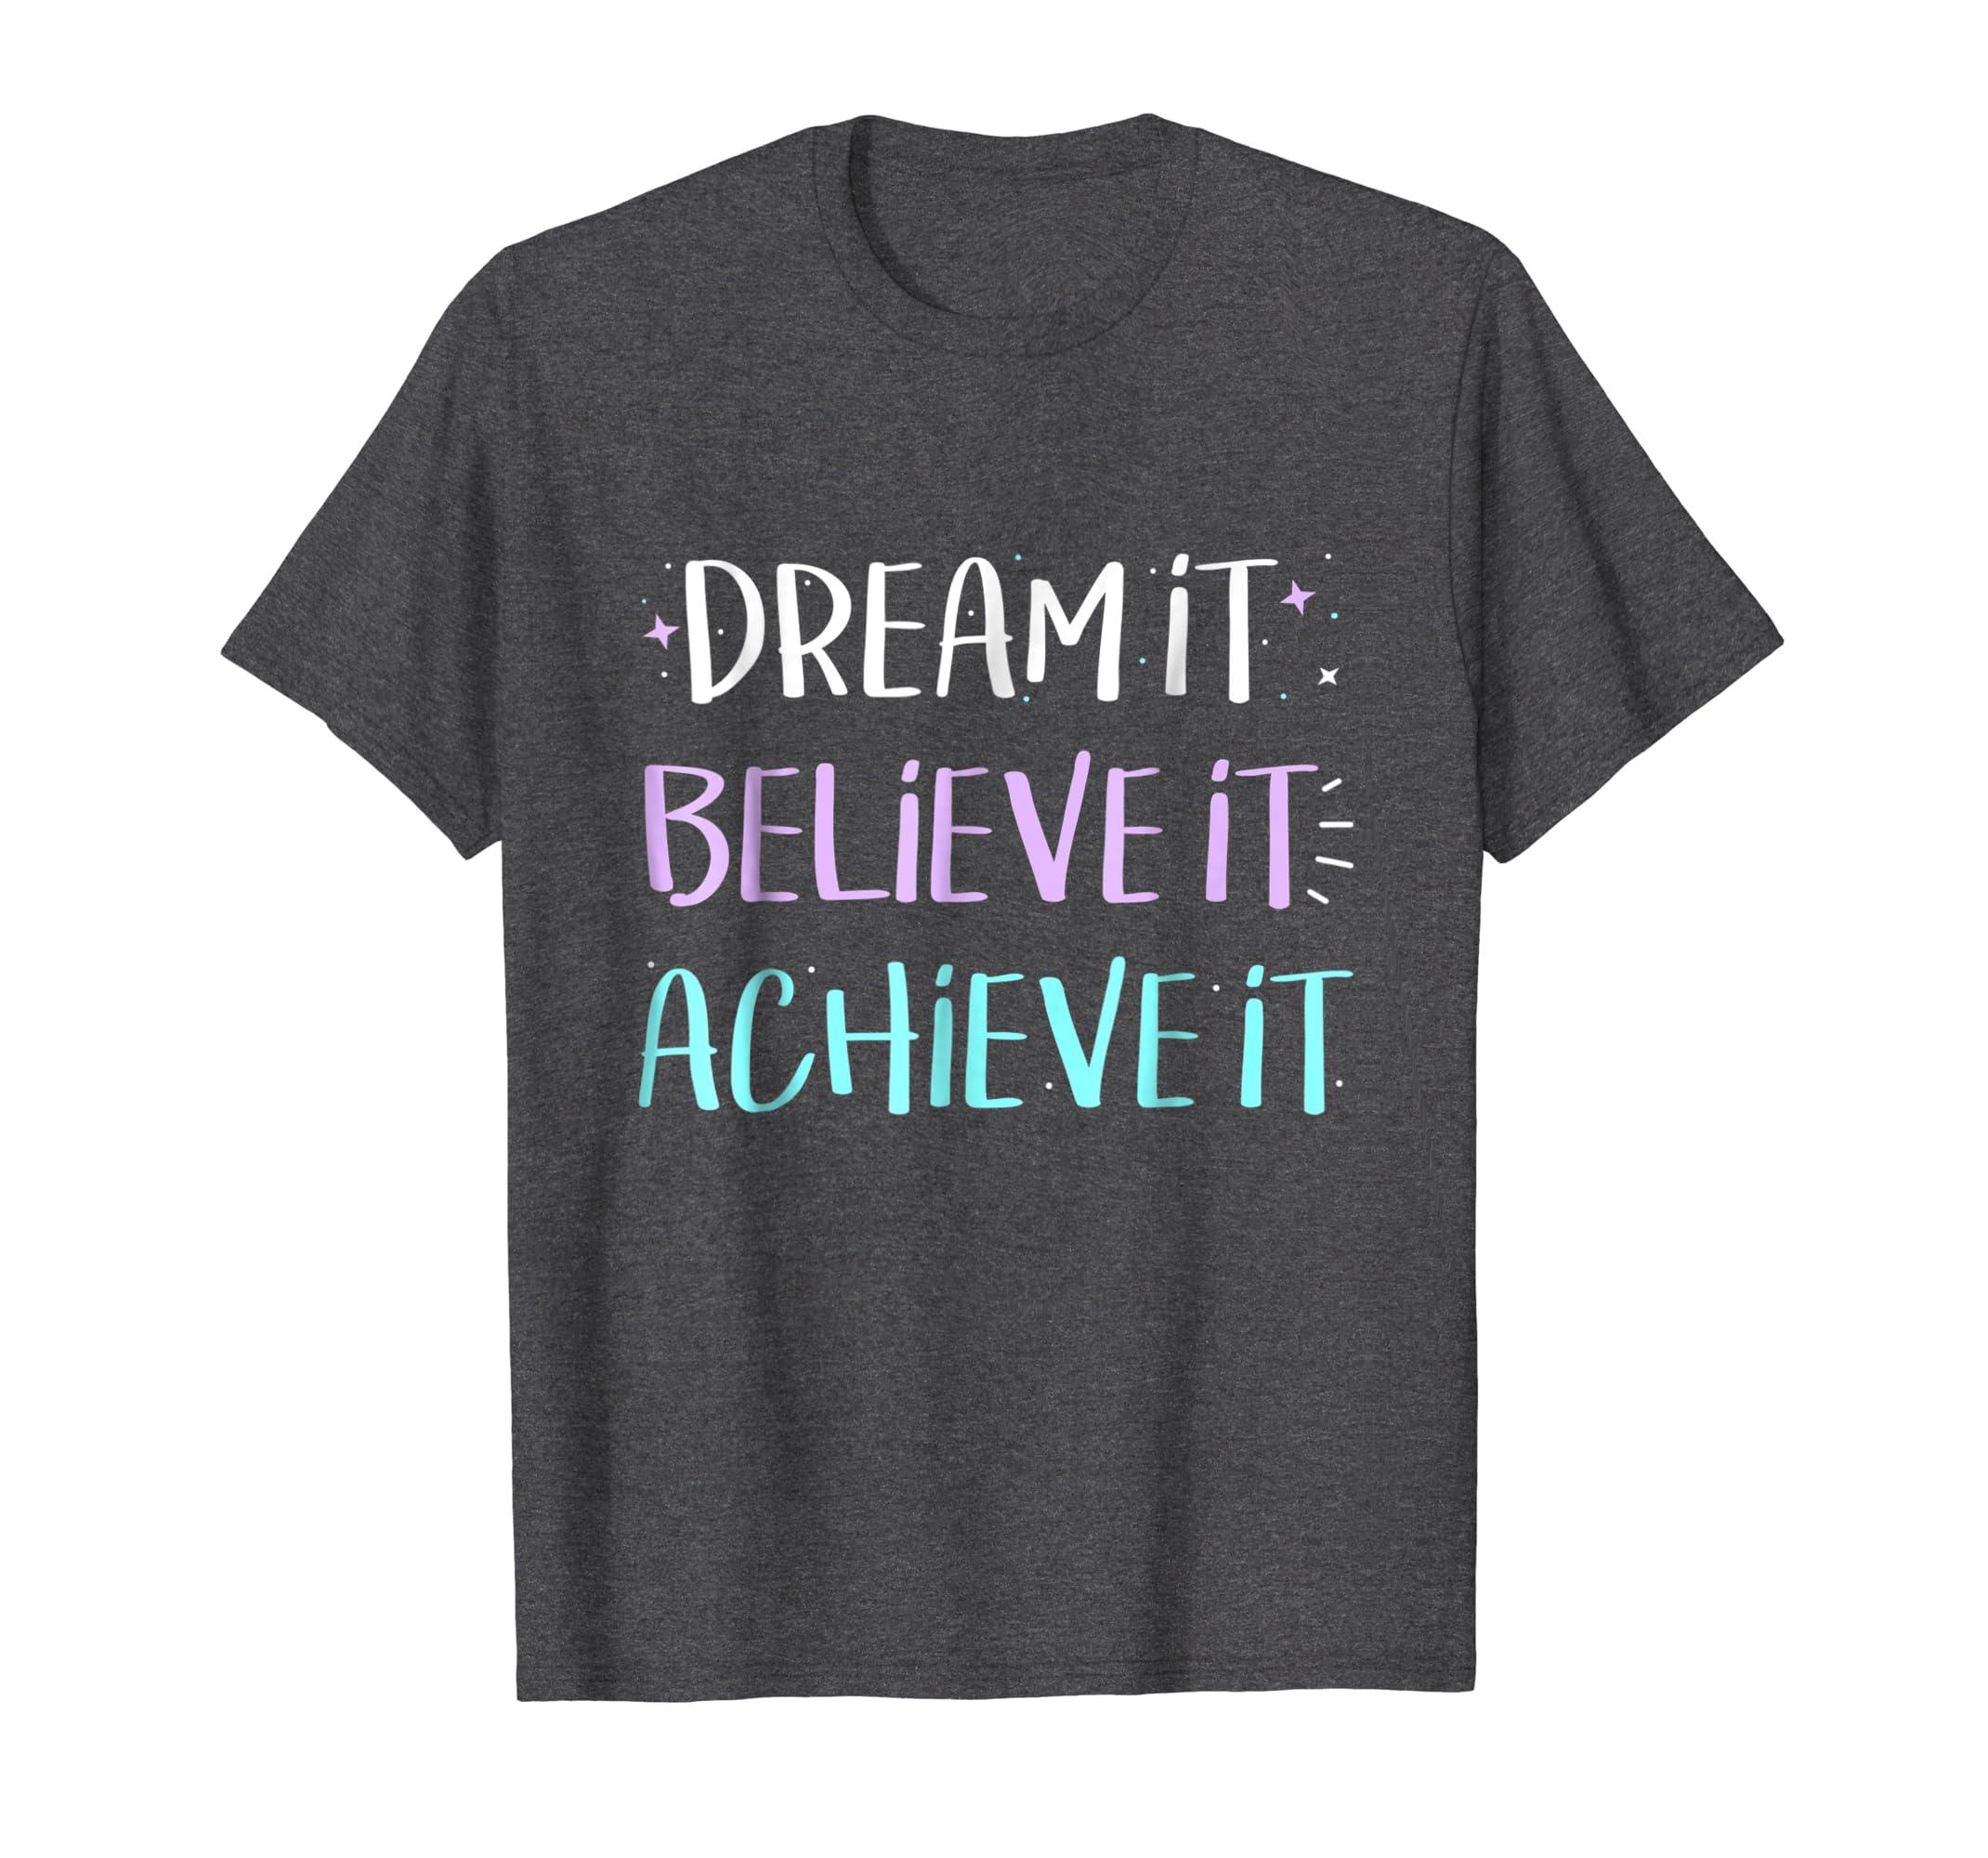 Dream It Believe It Achieve It TShirt Motivation-Awarplus